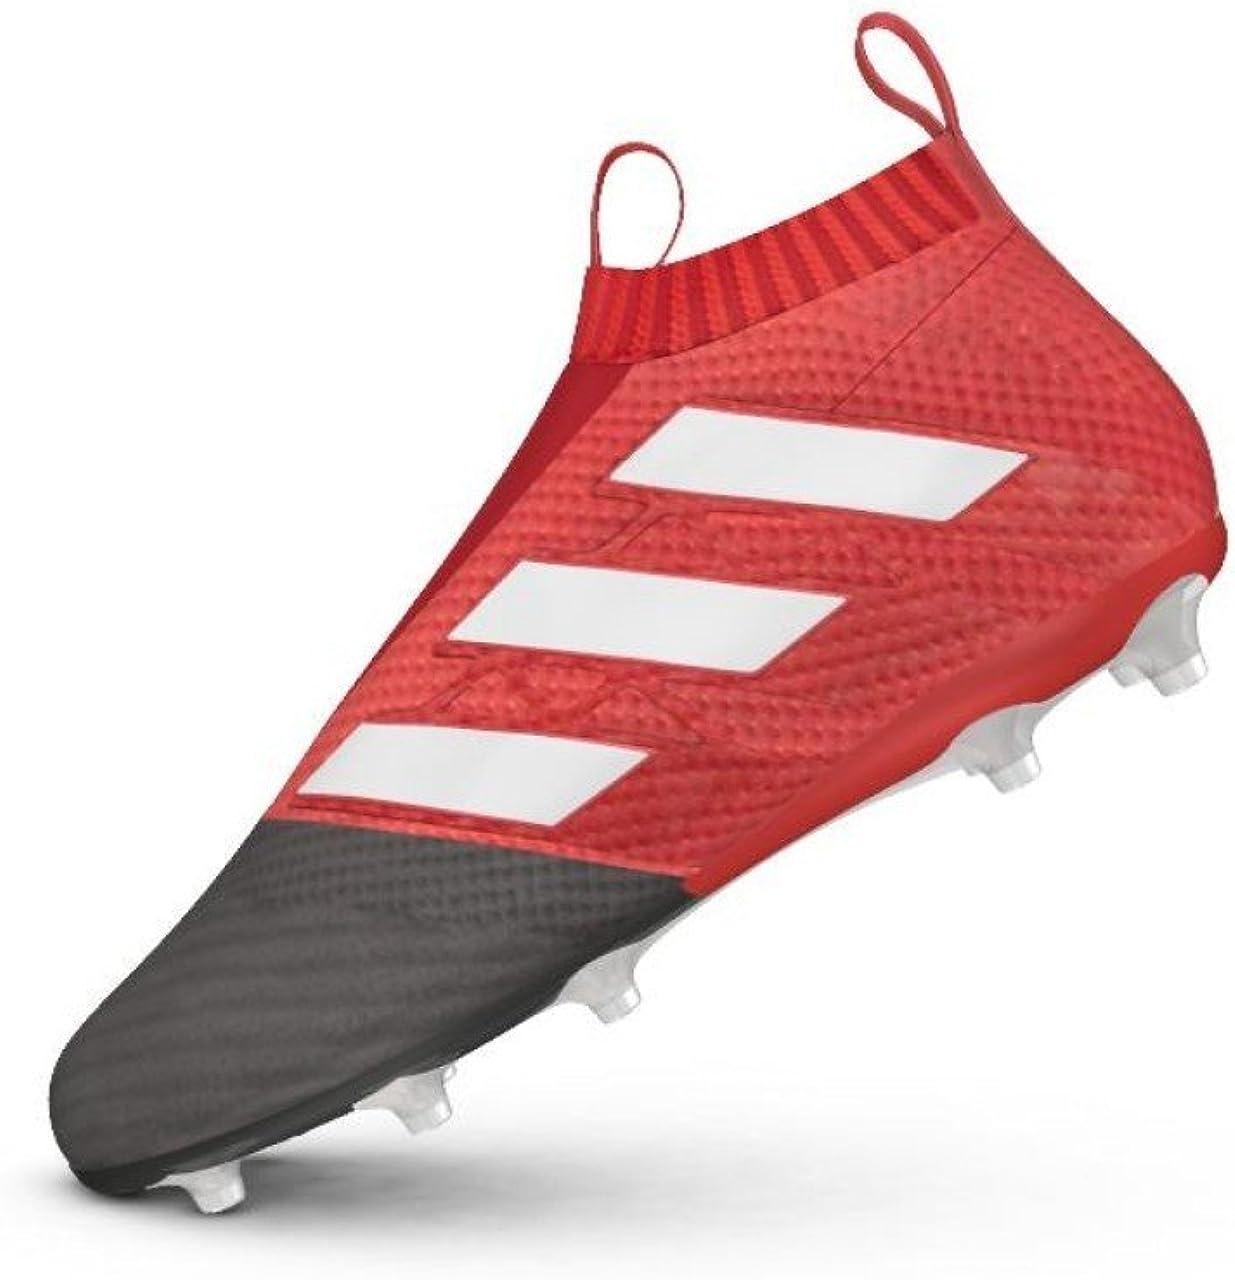 adidas Ace 17+ Purecontrol FG Garçon Chaussures Football